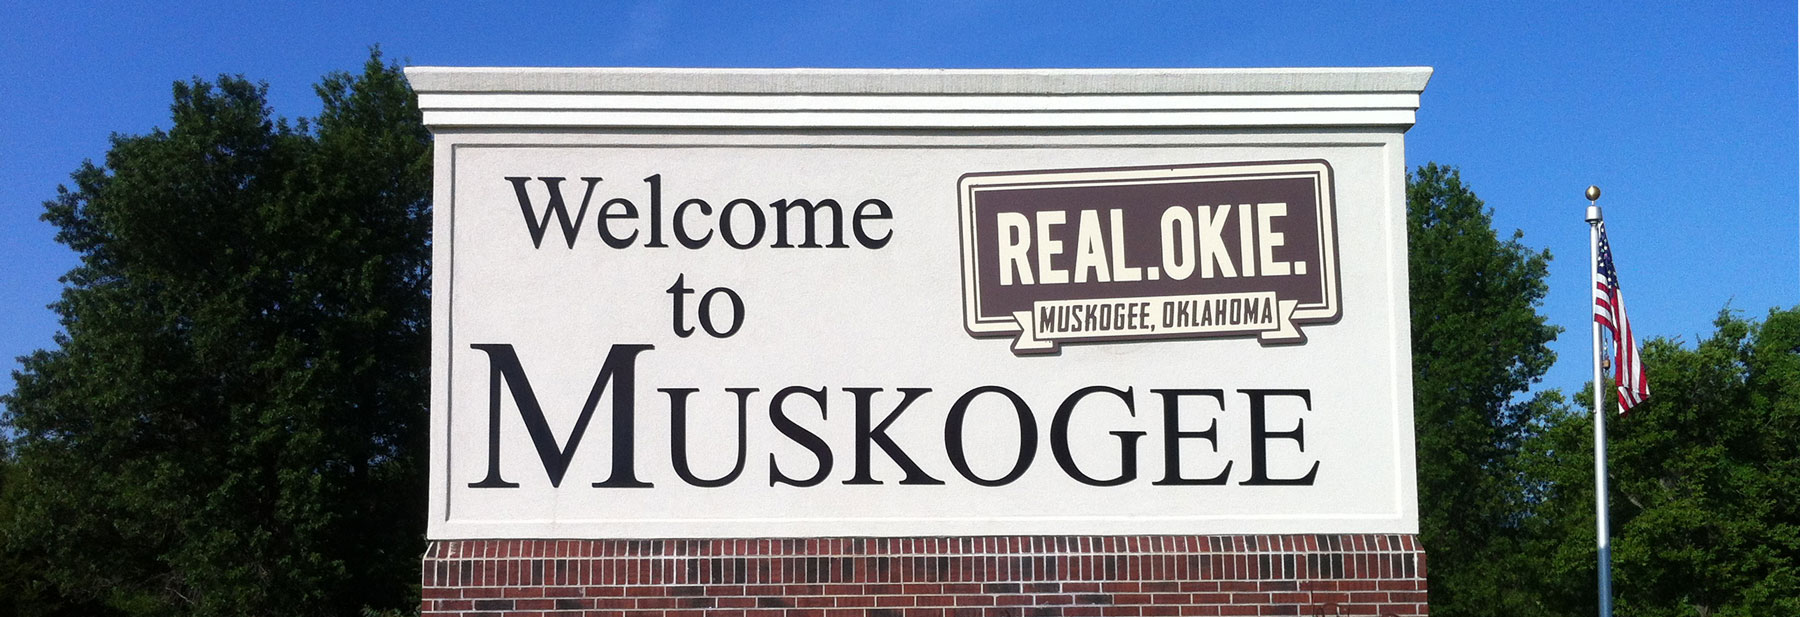 Real Okie Muskogee | Crossroads | Muskogee Oklahoma Community